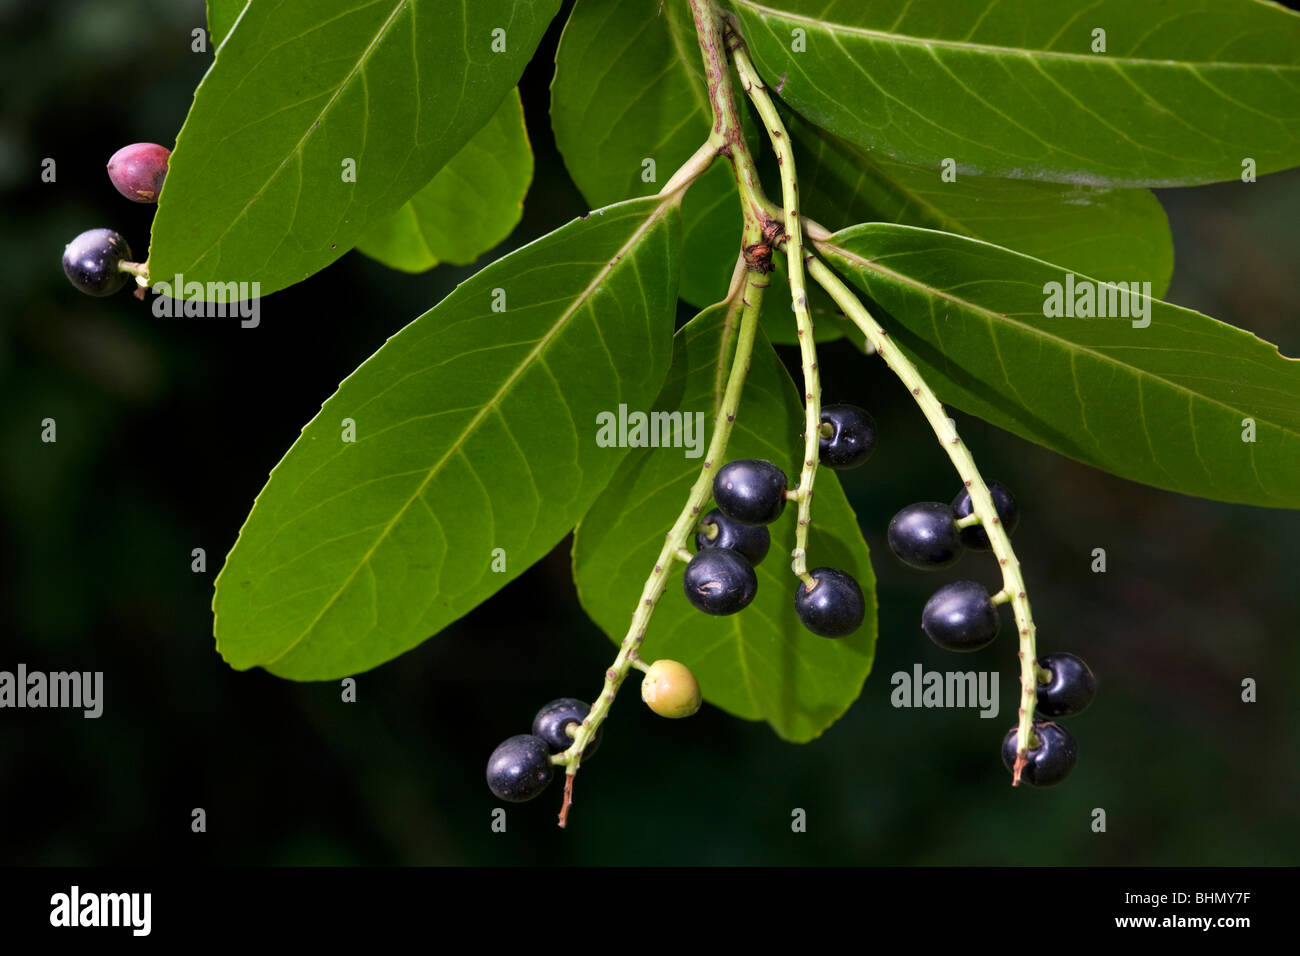 Kirschlorbeer / Englisch Lorbeer (Prunus Laurocerasus) mit Blättern und schwarzen Beeren, Belgien Stockbild